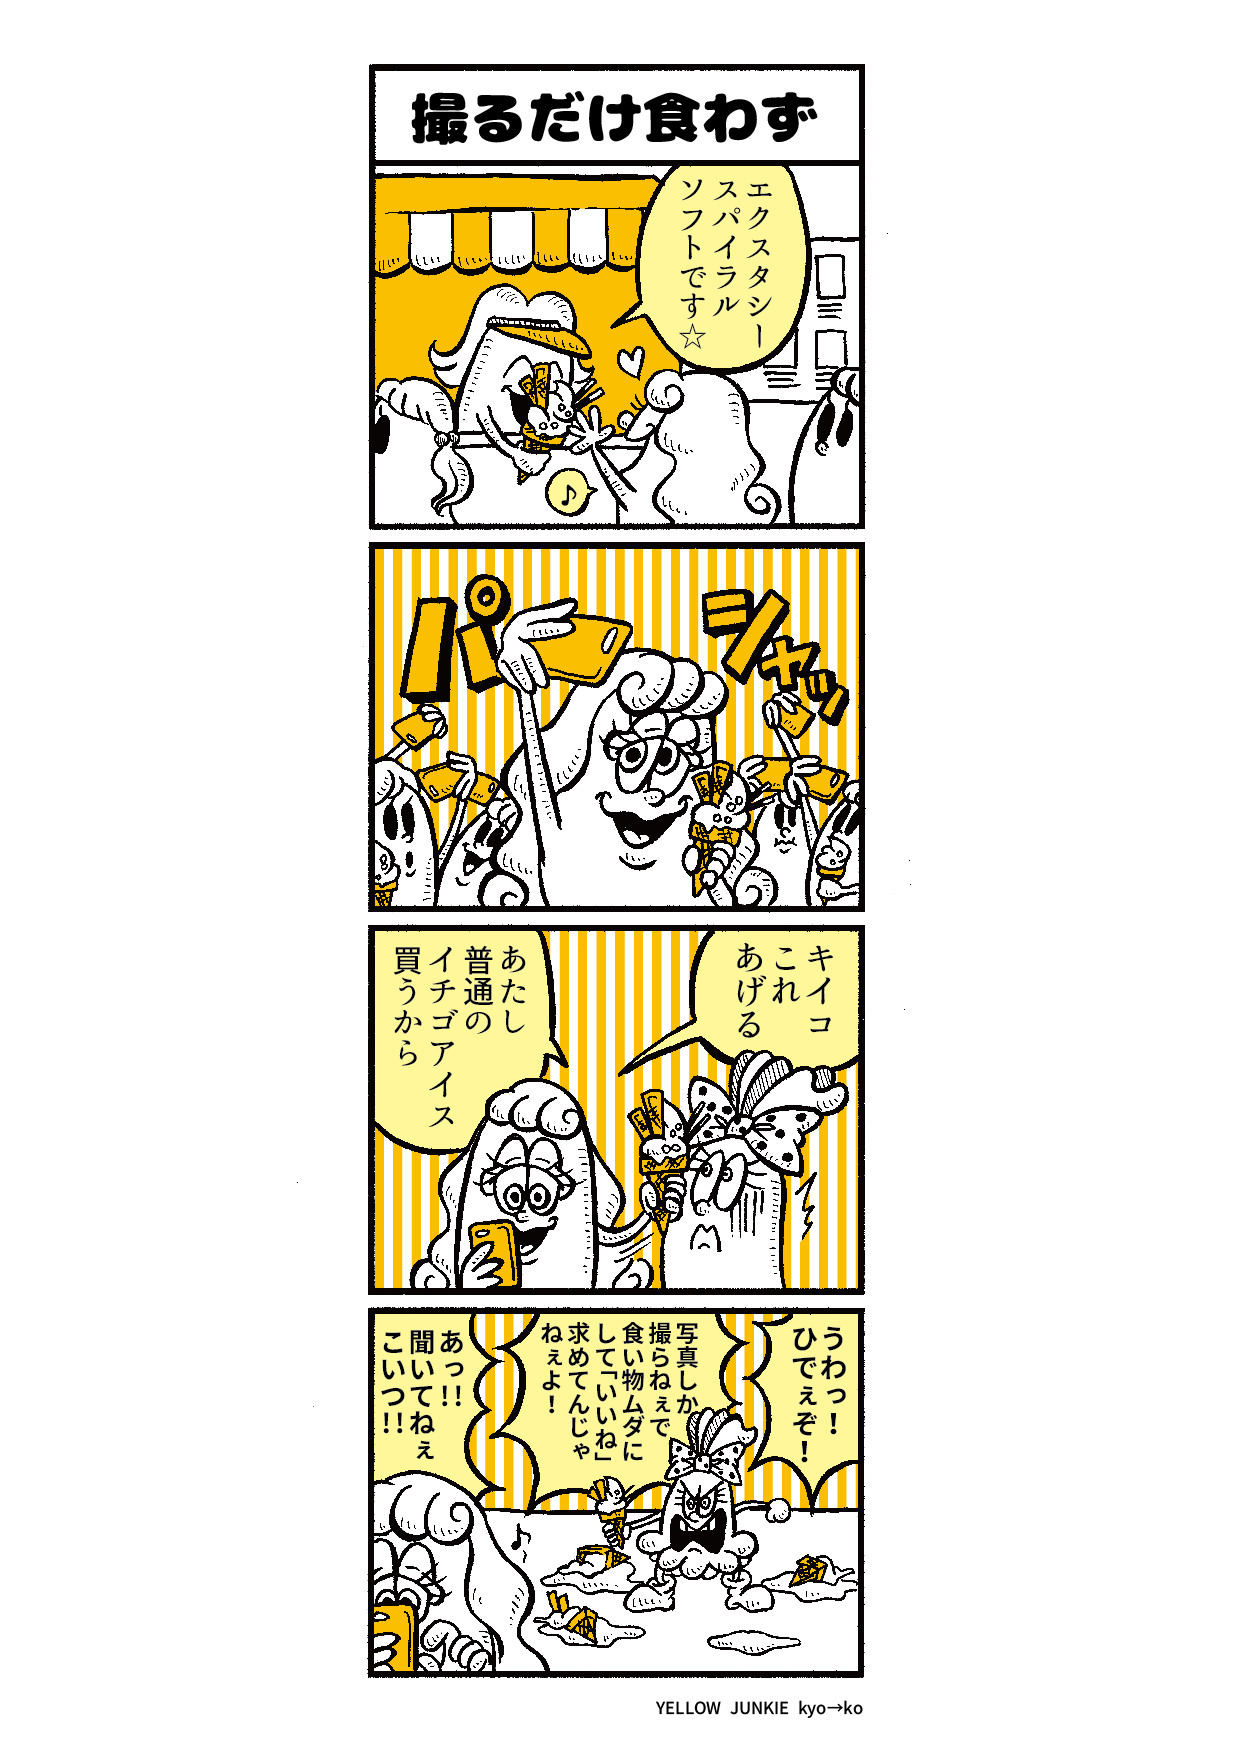 YELLOW JUNKIE「36話:撮るだけ食わず」